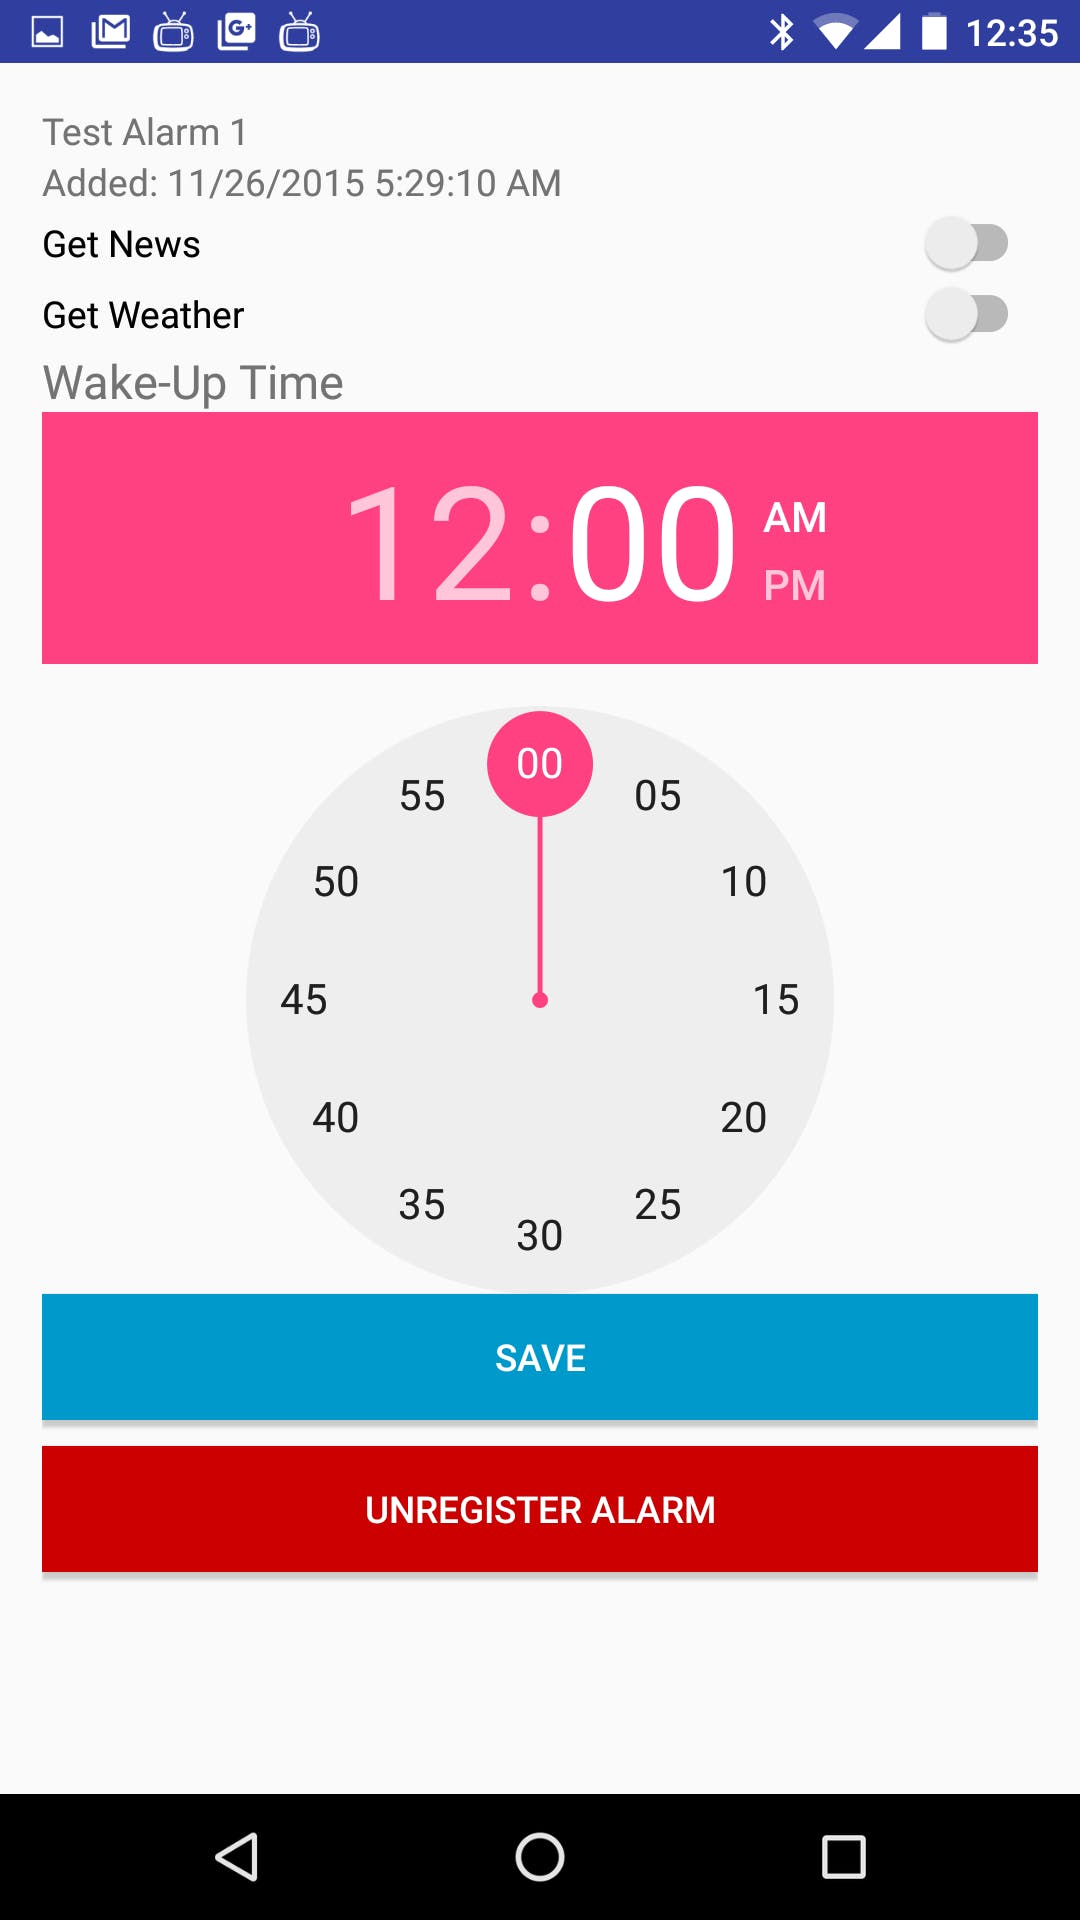 Alarm settings activity